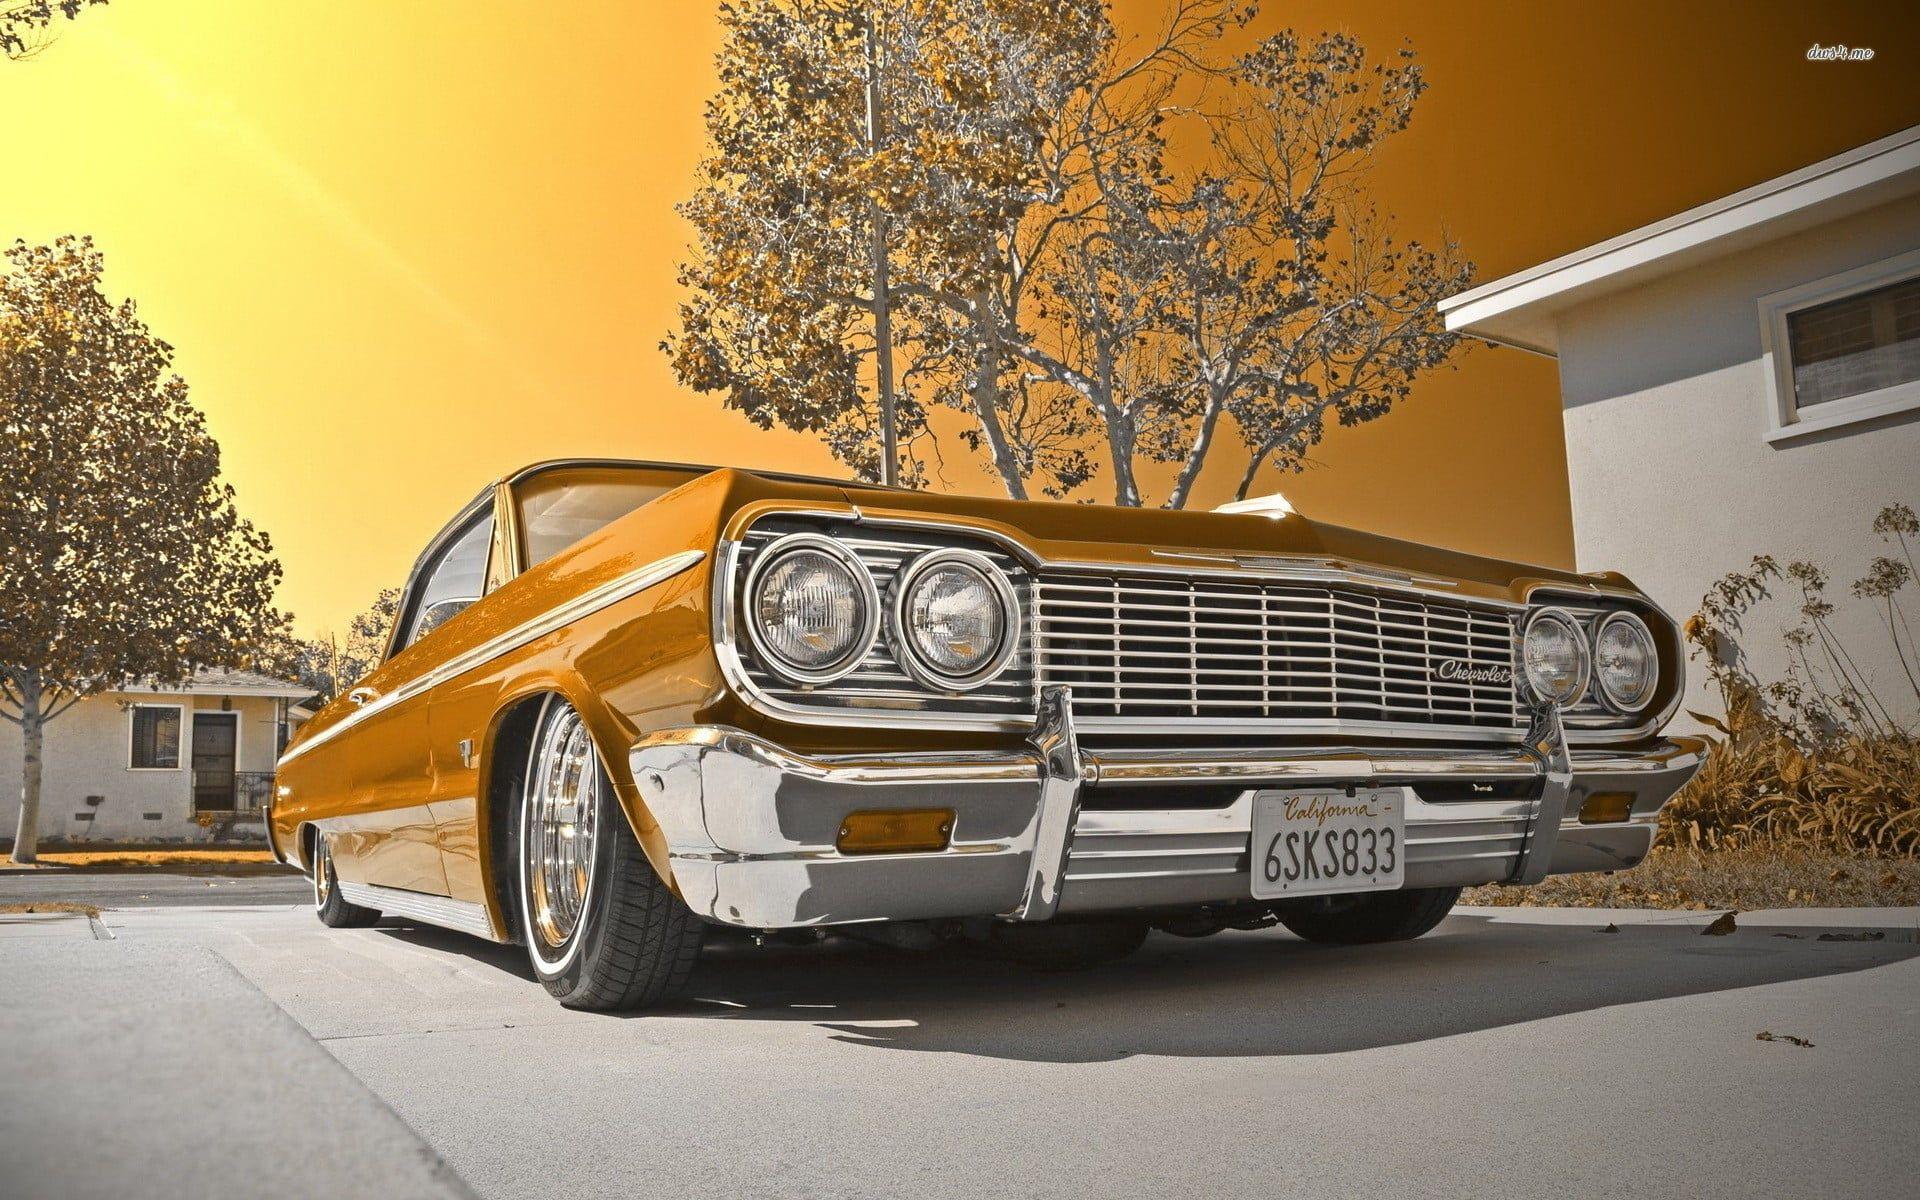 Vintage Brown Car Lowrider Chevrolet Impala 1080p Wallpaper Hdwallpaper Desktop Impala Car Chevrolet Impala Impala